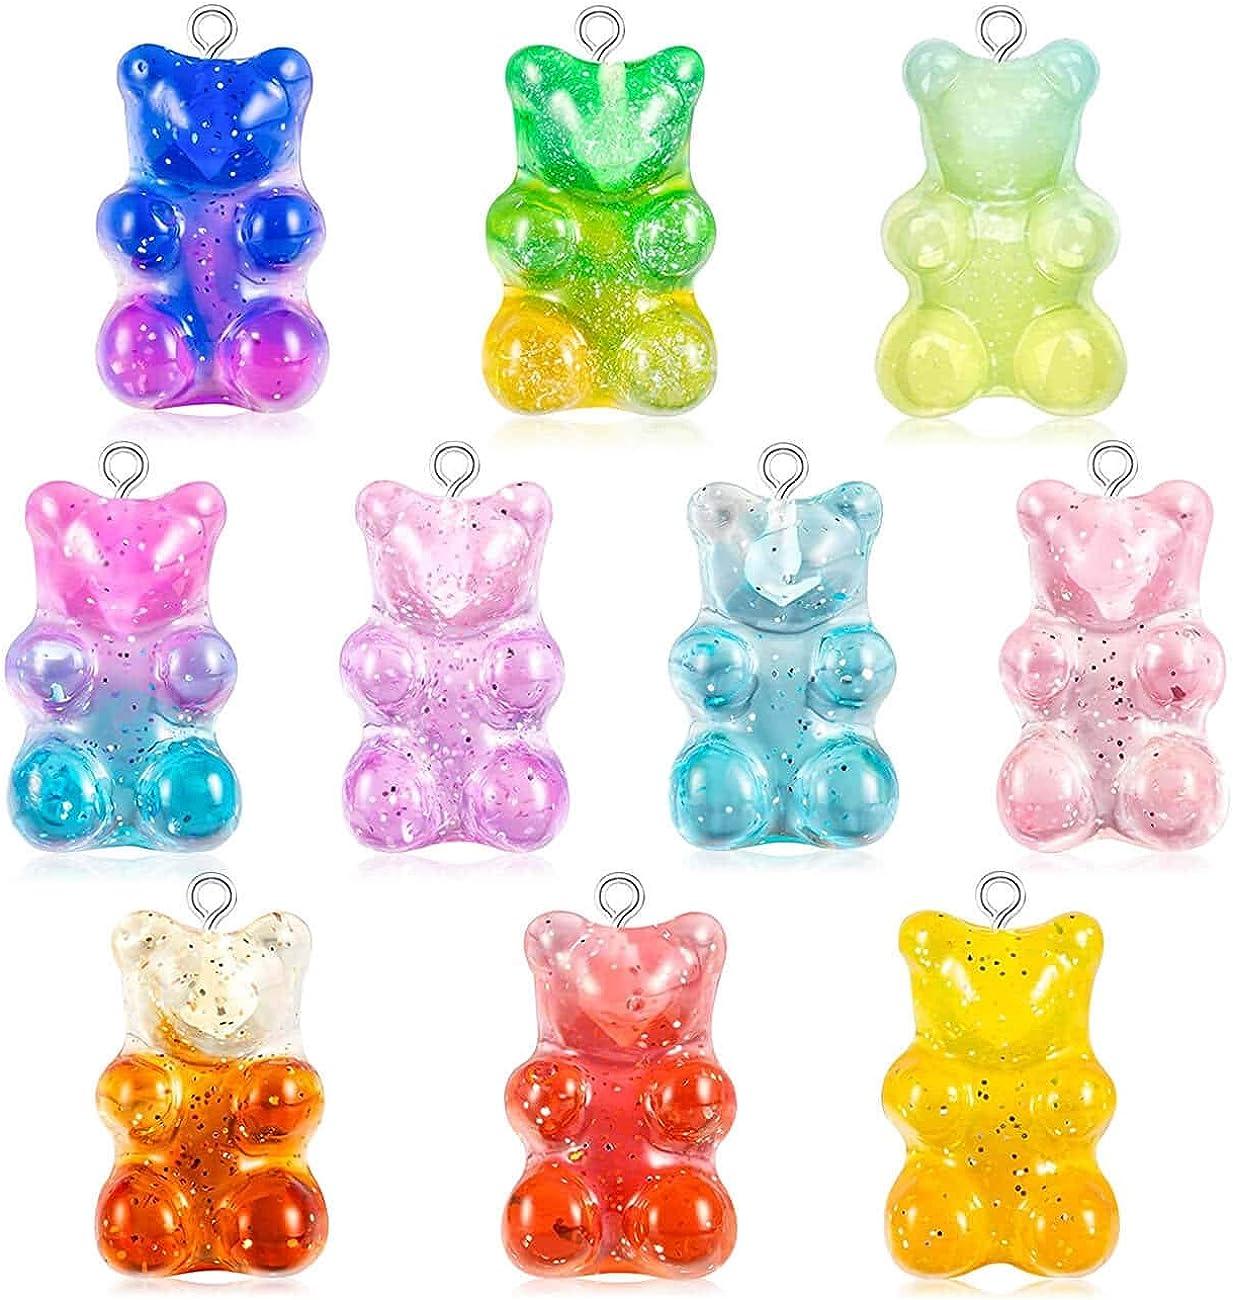 Gradient color gummy bear pendant accessories candy bear keychain accessories child keychain DIY necklace girl earring bracelet pendant jewelry making supplies